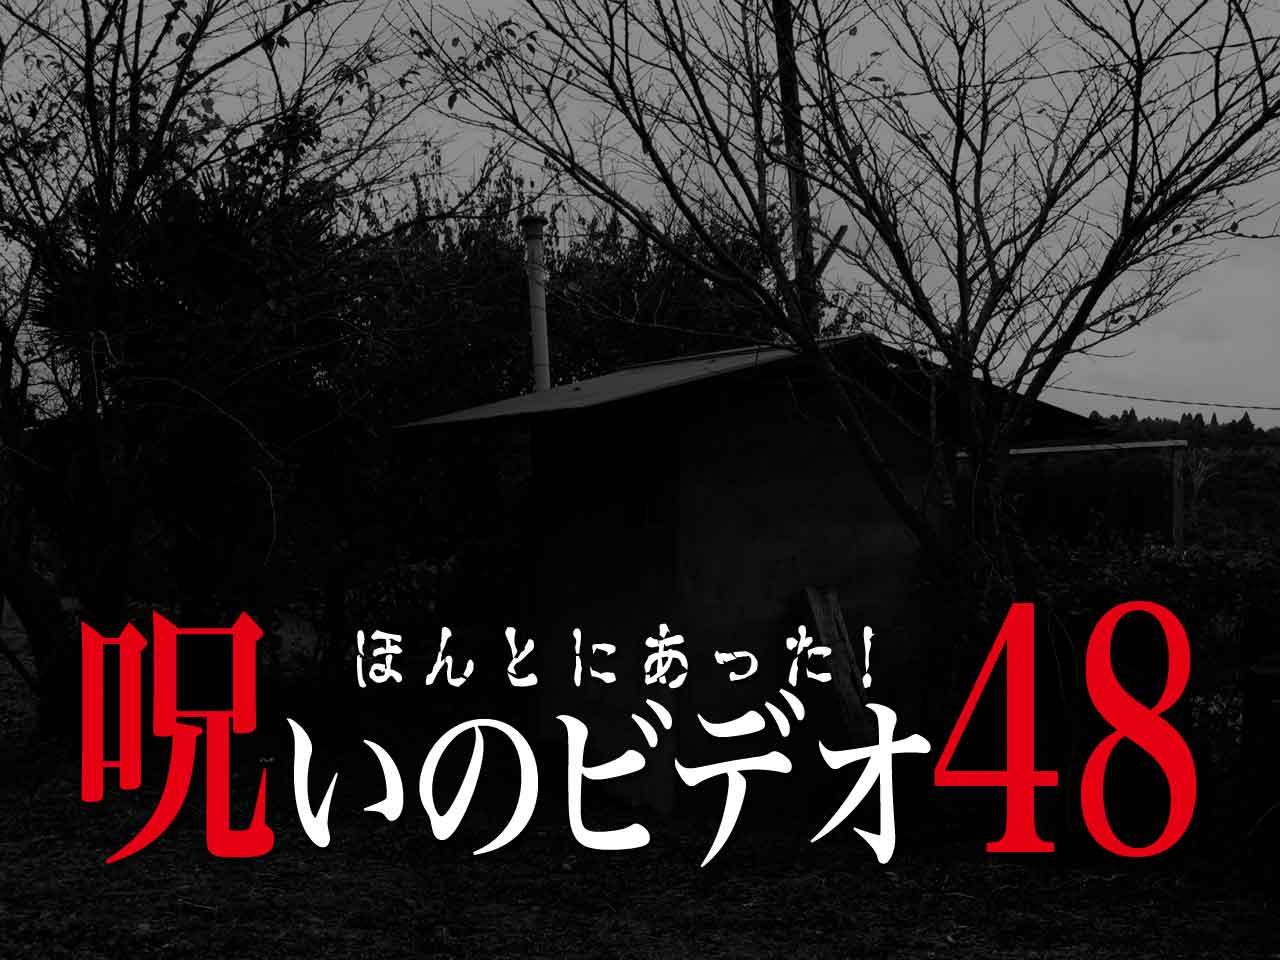 eye_catch_noro_48